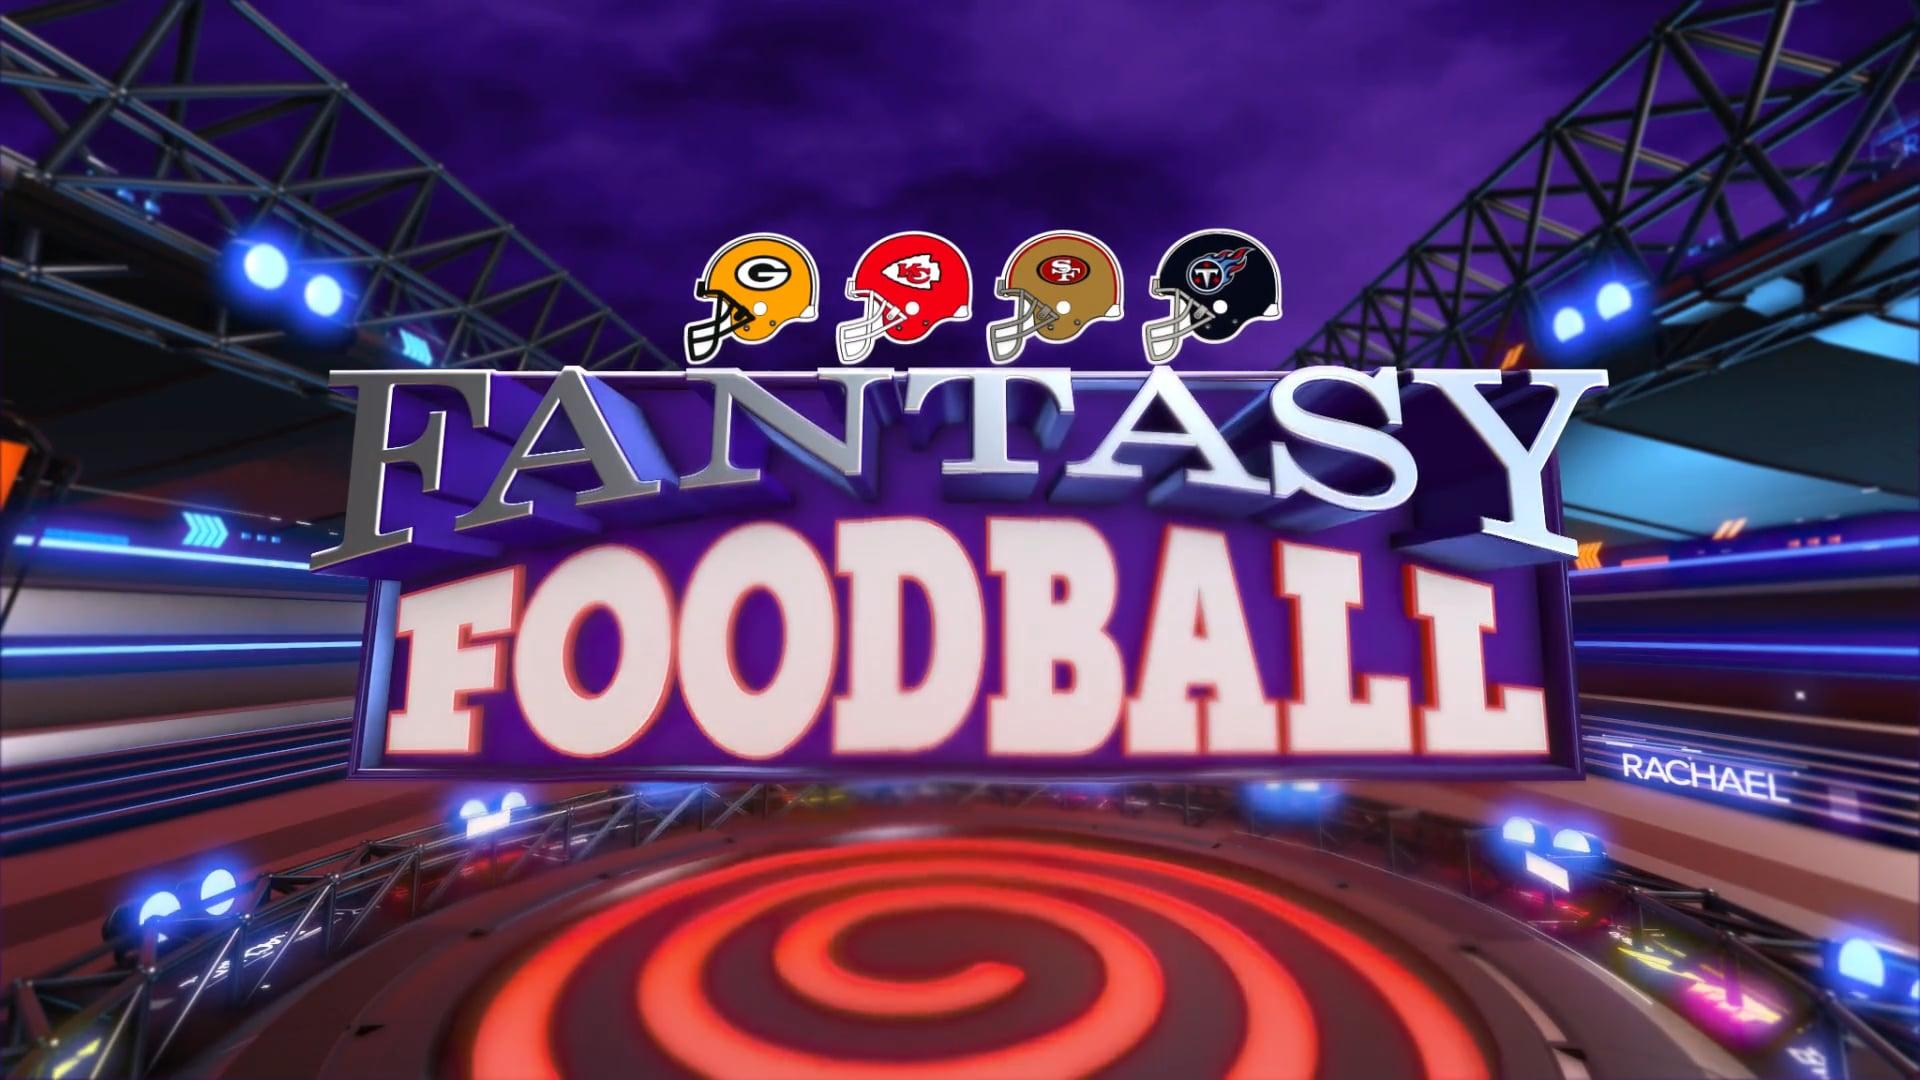 Fantasy Foodball 2020